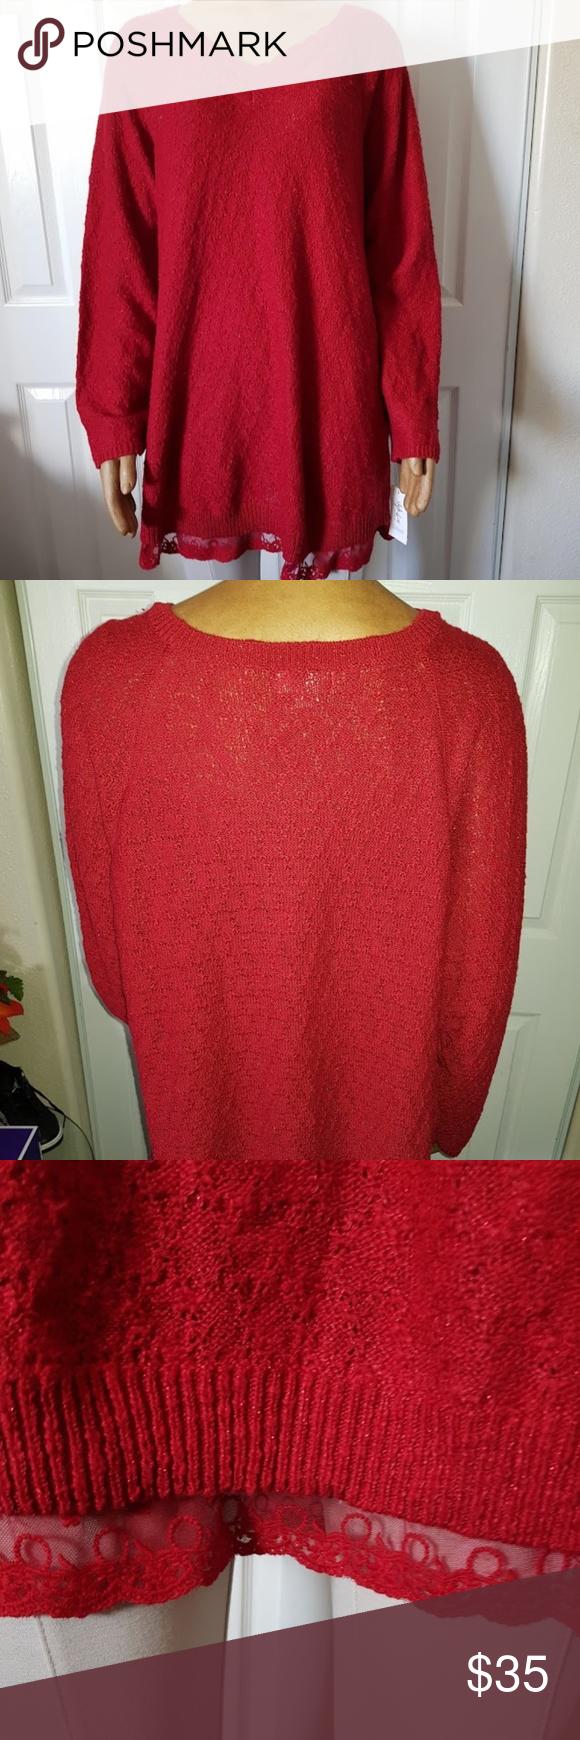 8560edb69baaa Style Co Plus Size Lace-Trimmed Tunic Canyon Red Body 53% Cotton 40%  Acrylic 5% Polyester 2% Metallic Trim 51% Cotton 49% Nylon  391 Style   Co  Tops Tunics